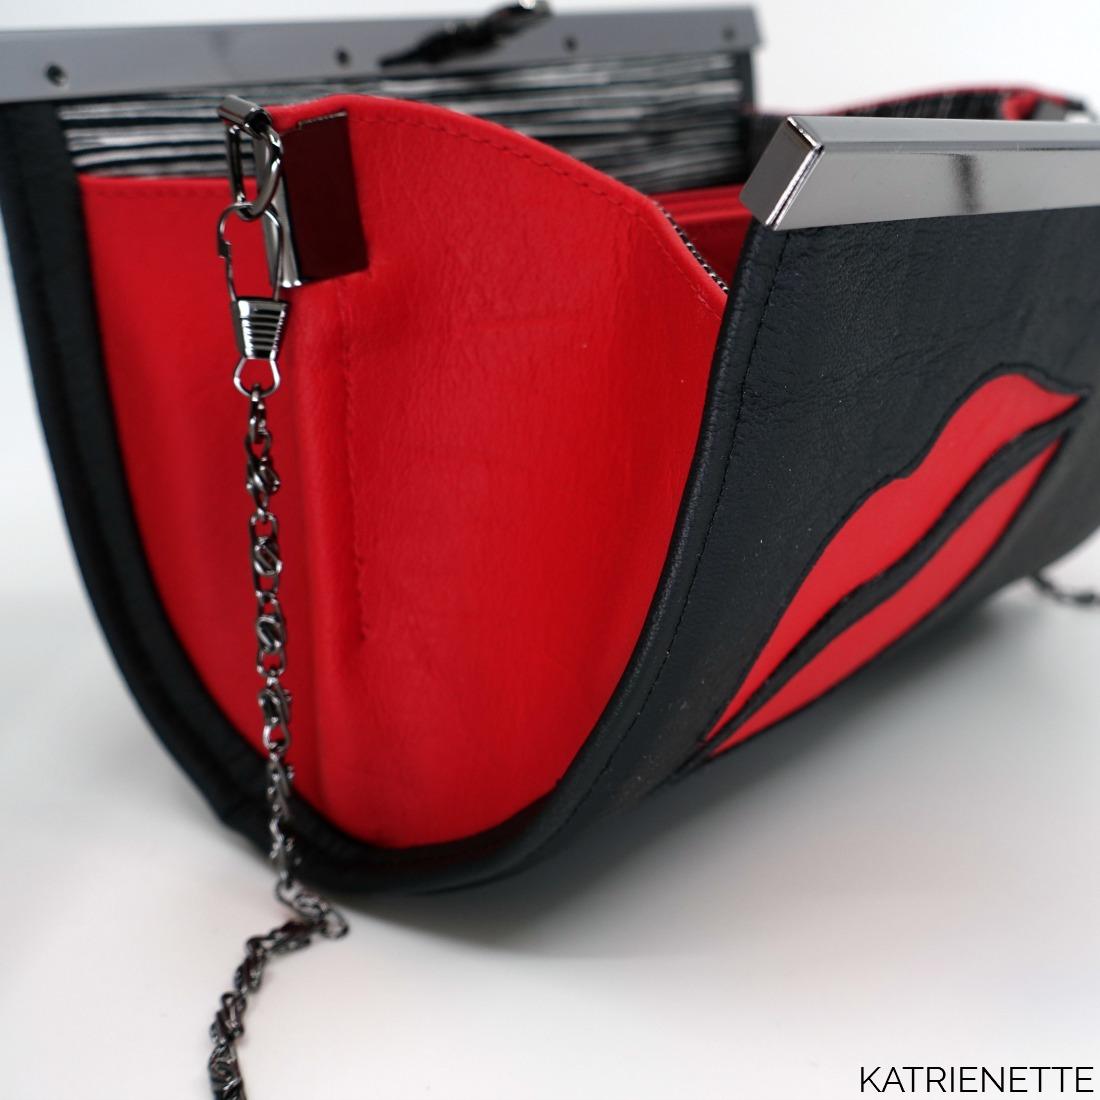 katrienette K-bas k-bas.be Kbassen madammen met kbassen kabas blog tour blogtour Joy clutch kunstleer faux leather rozy sewing bags bagmaker naaien sisko by mieke free pattern gratis patroon clutch